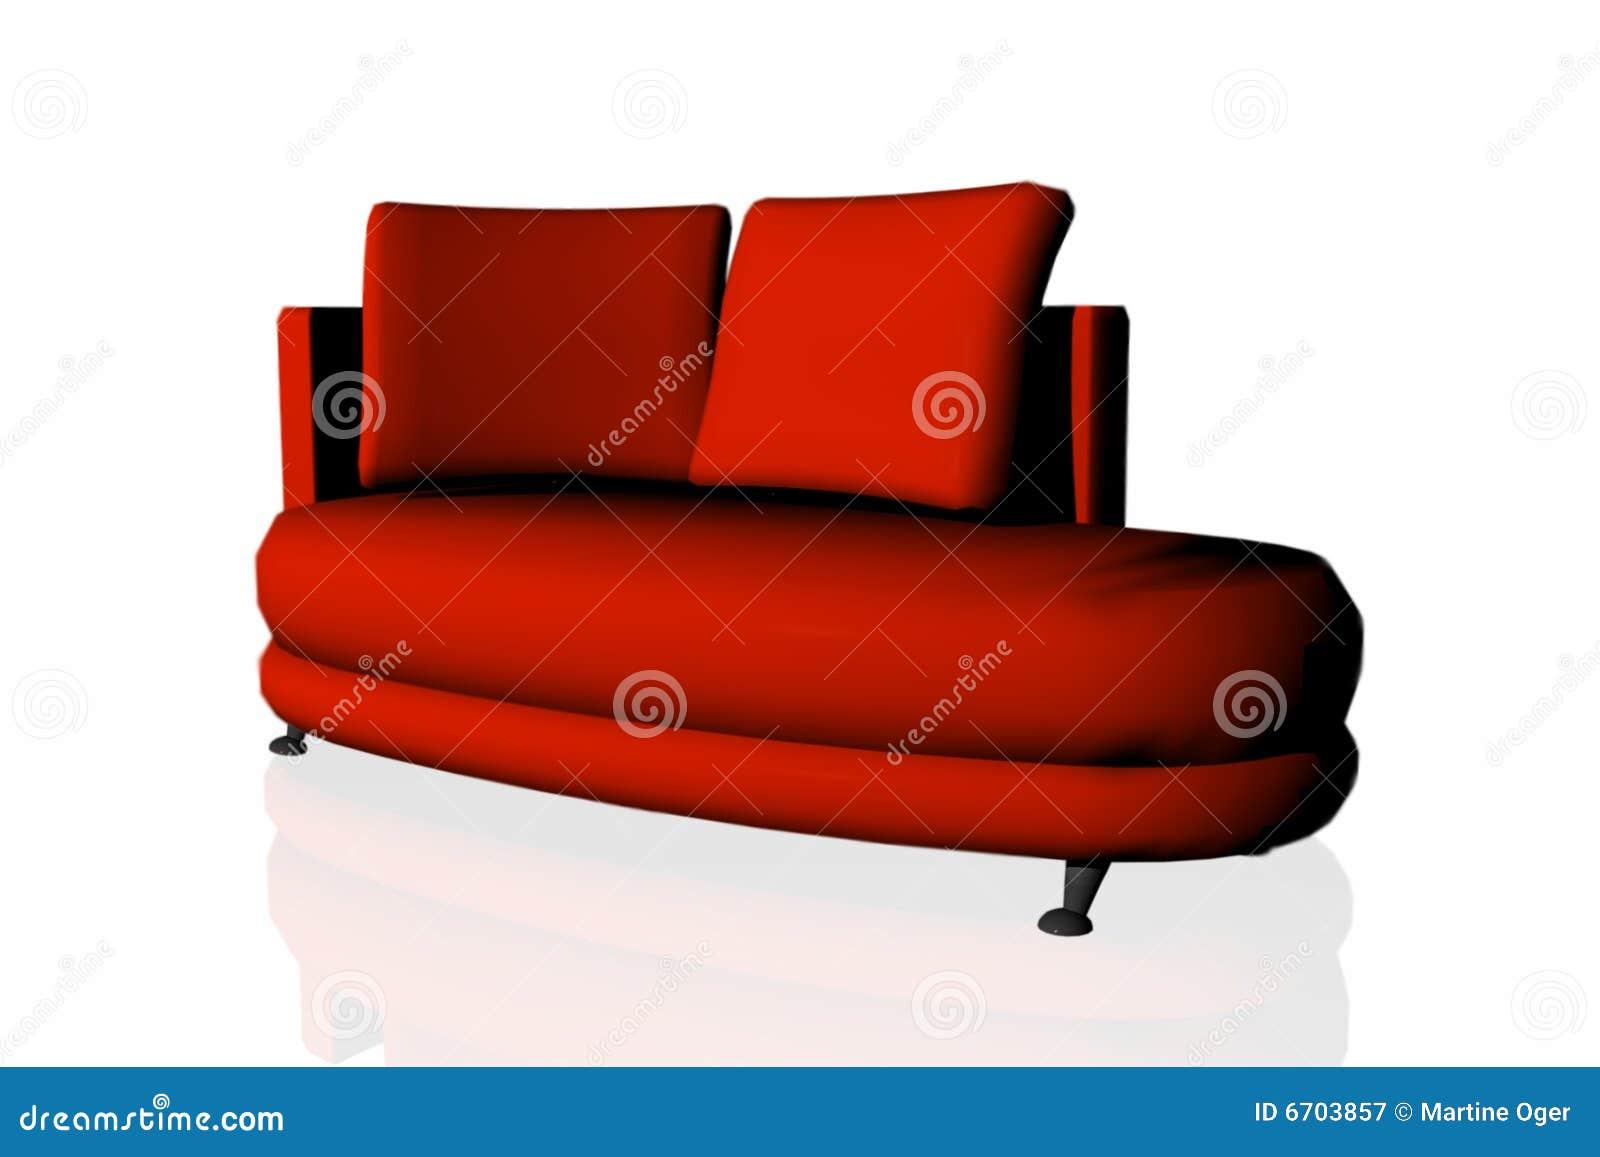 modern red divan royalty free stock photography image. Black Bedroom Furniture Sets. Home Design Ideas